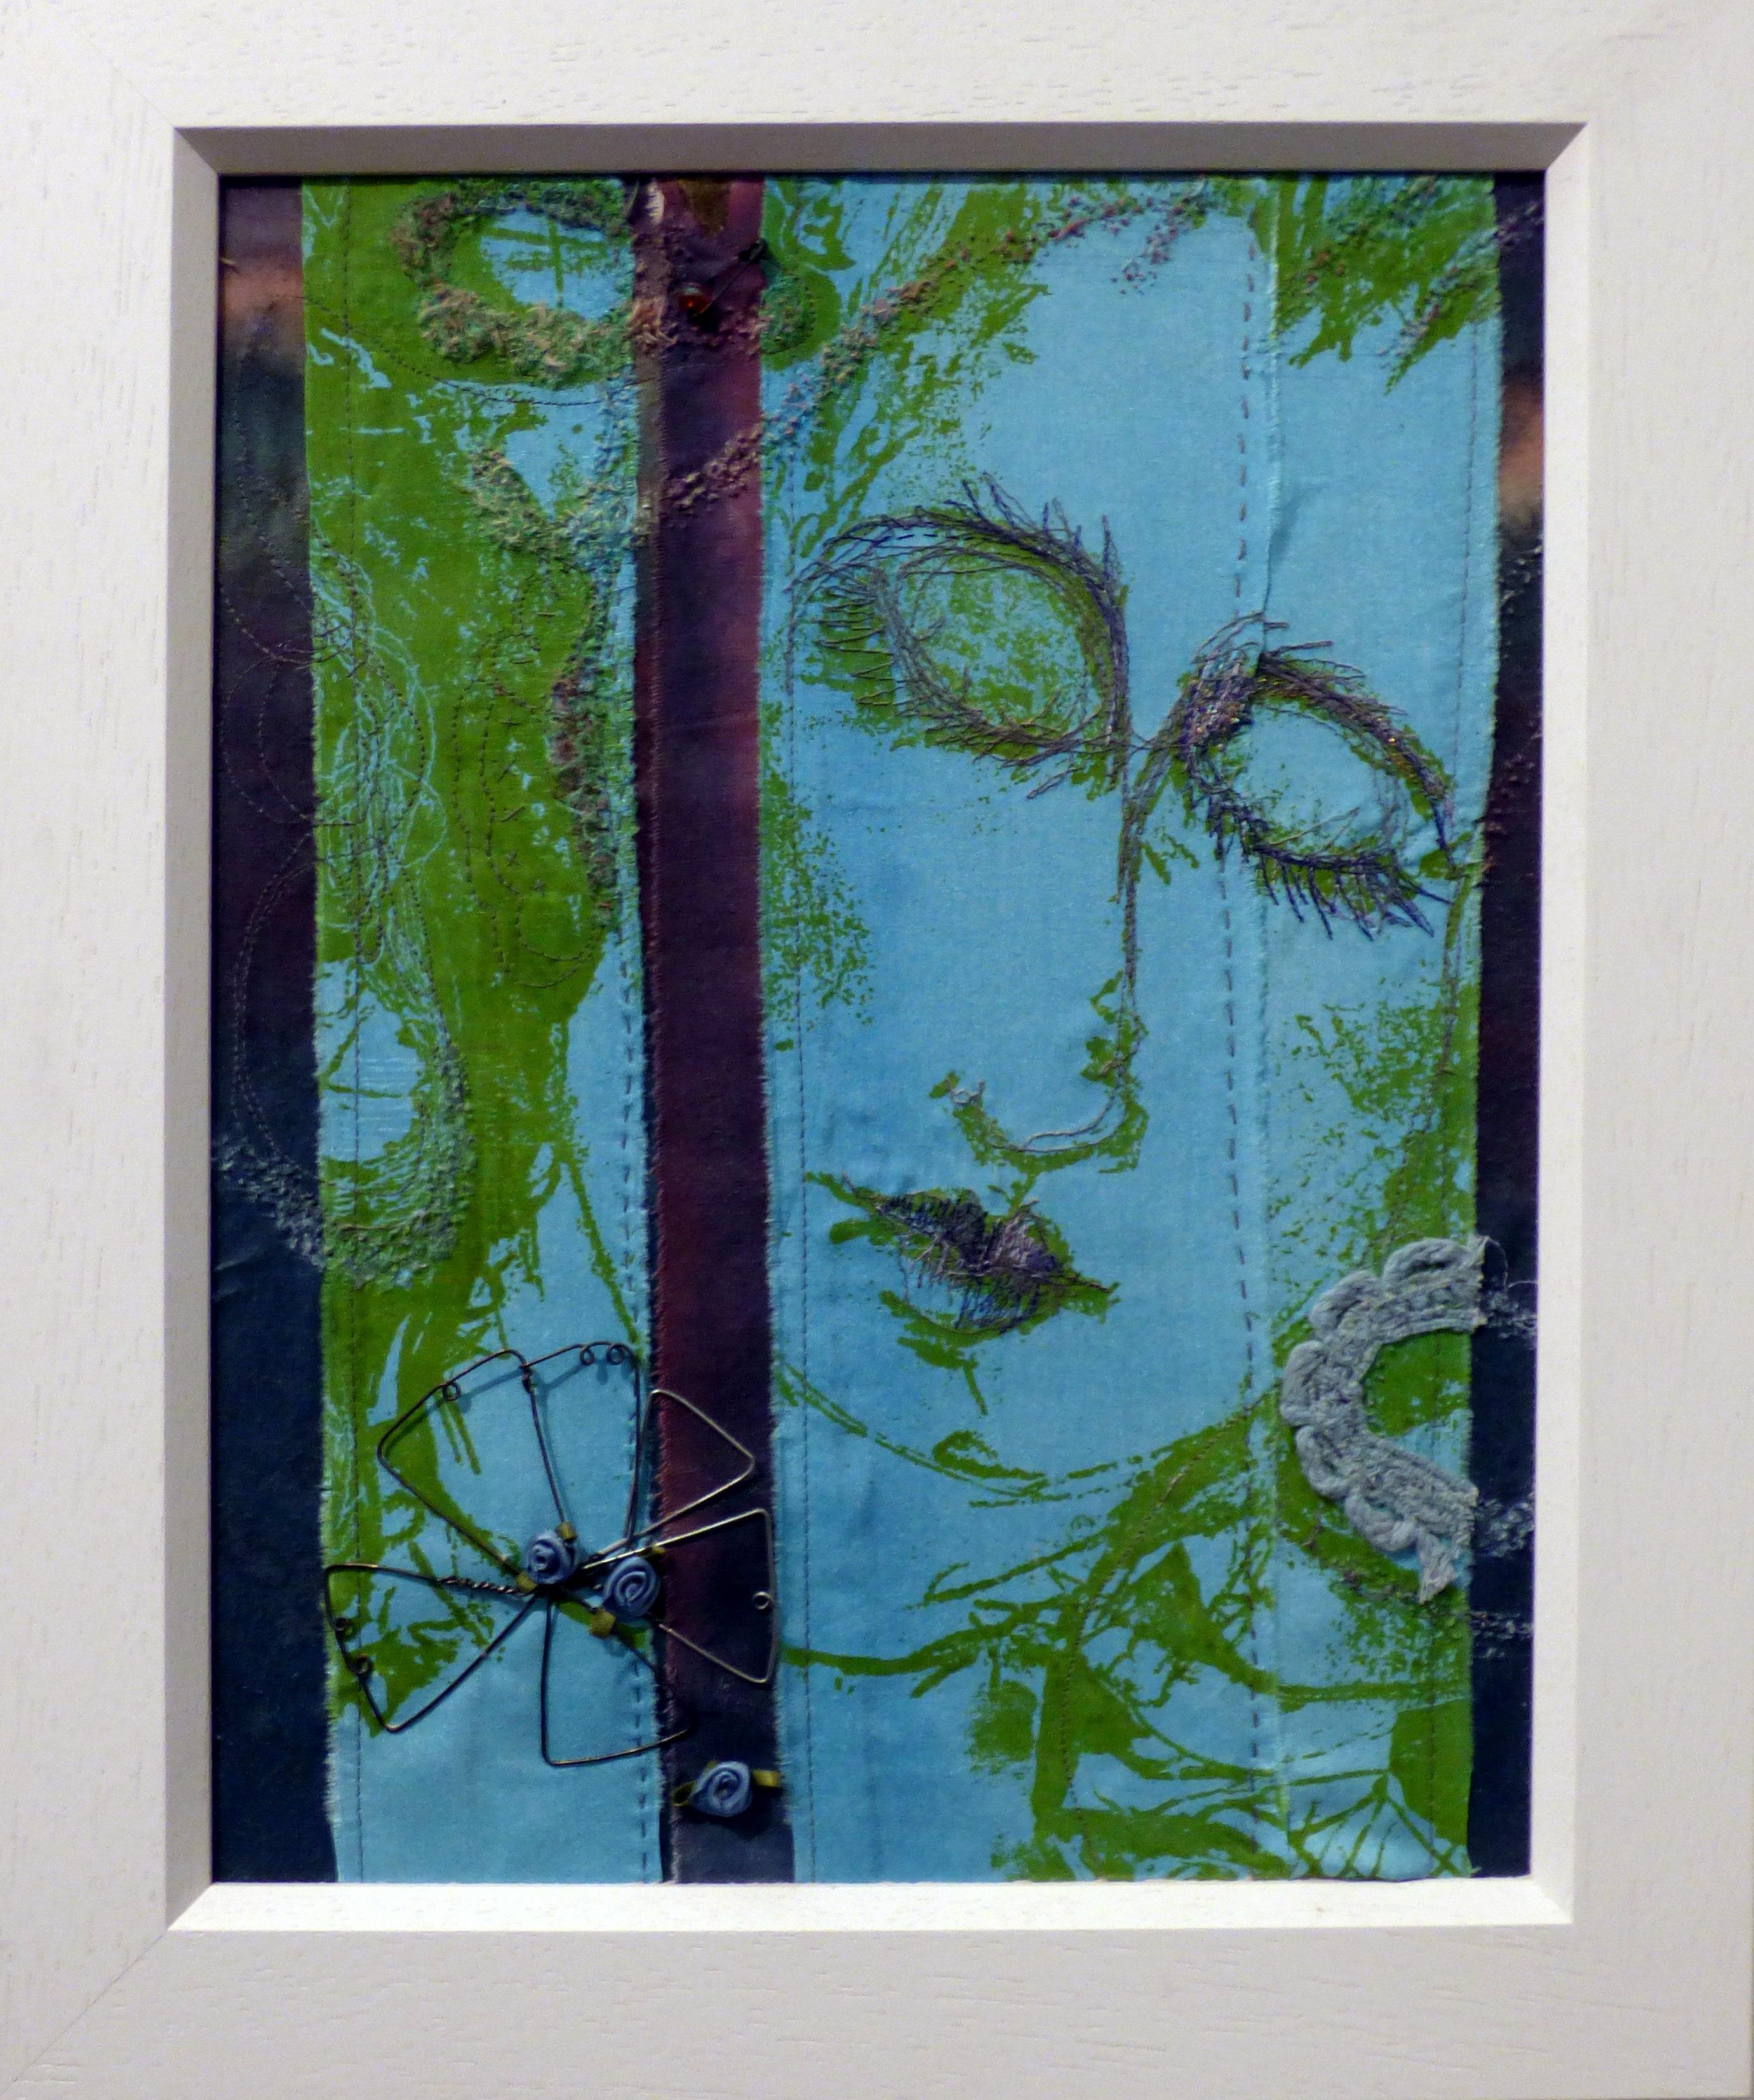 SORROW by Yvonne Noworyta, Ten Plus exhibition, Nantwich